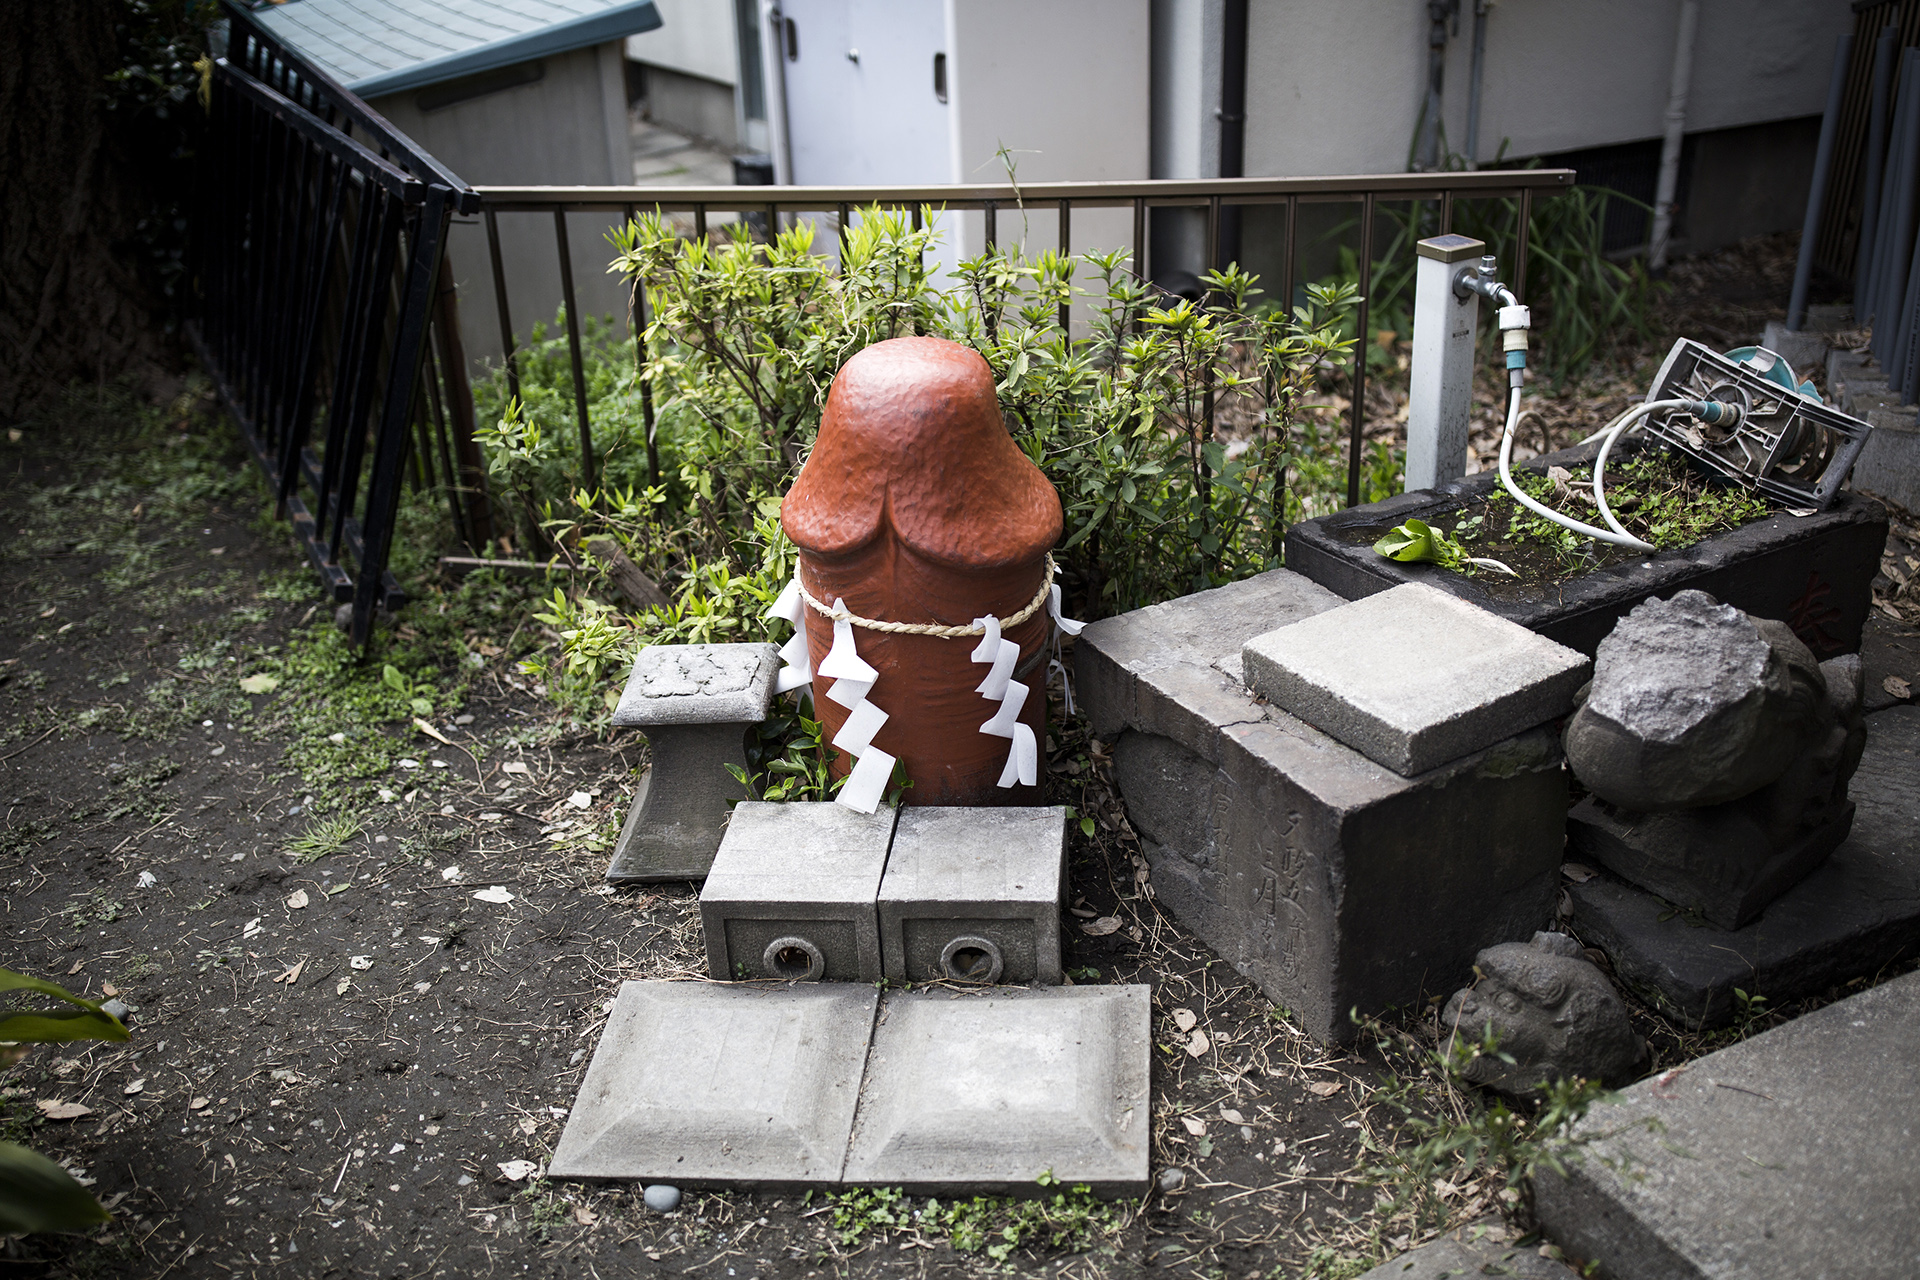 Una estatua con forma de pene (AFP)